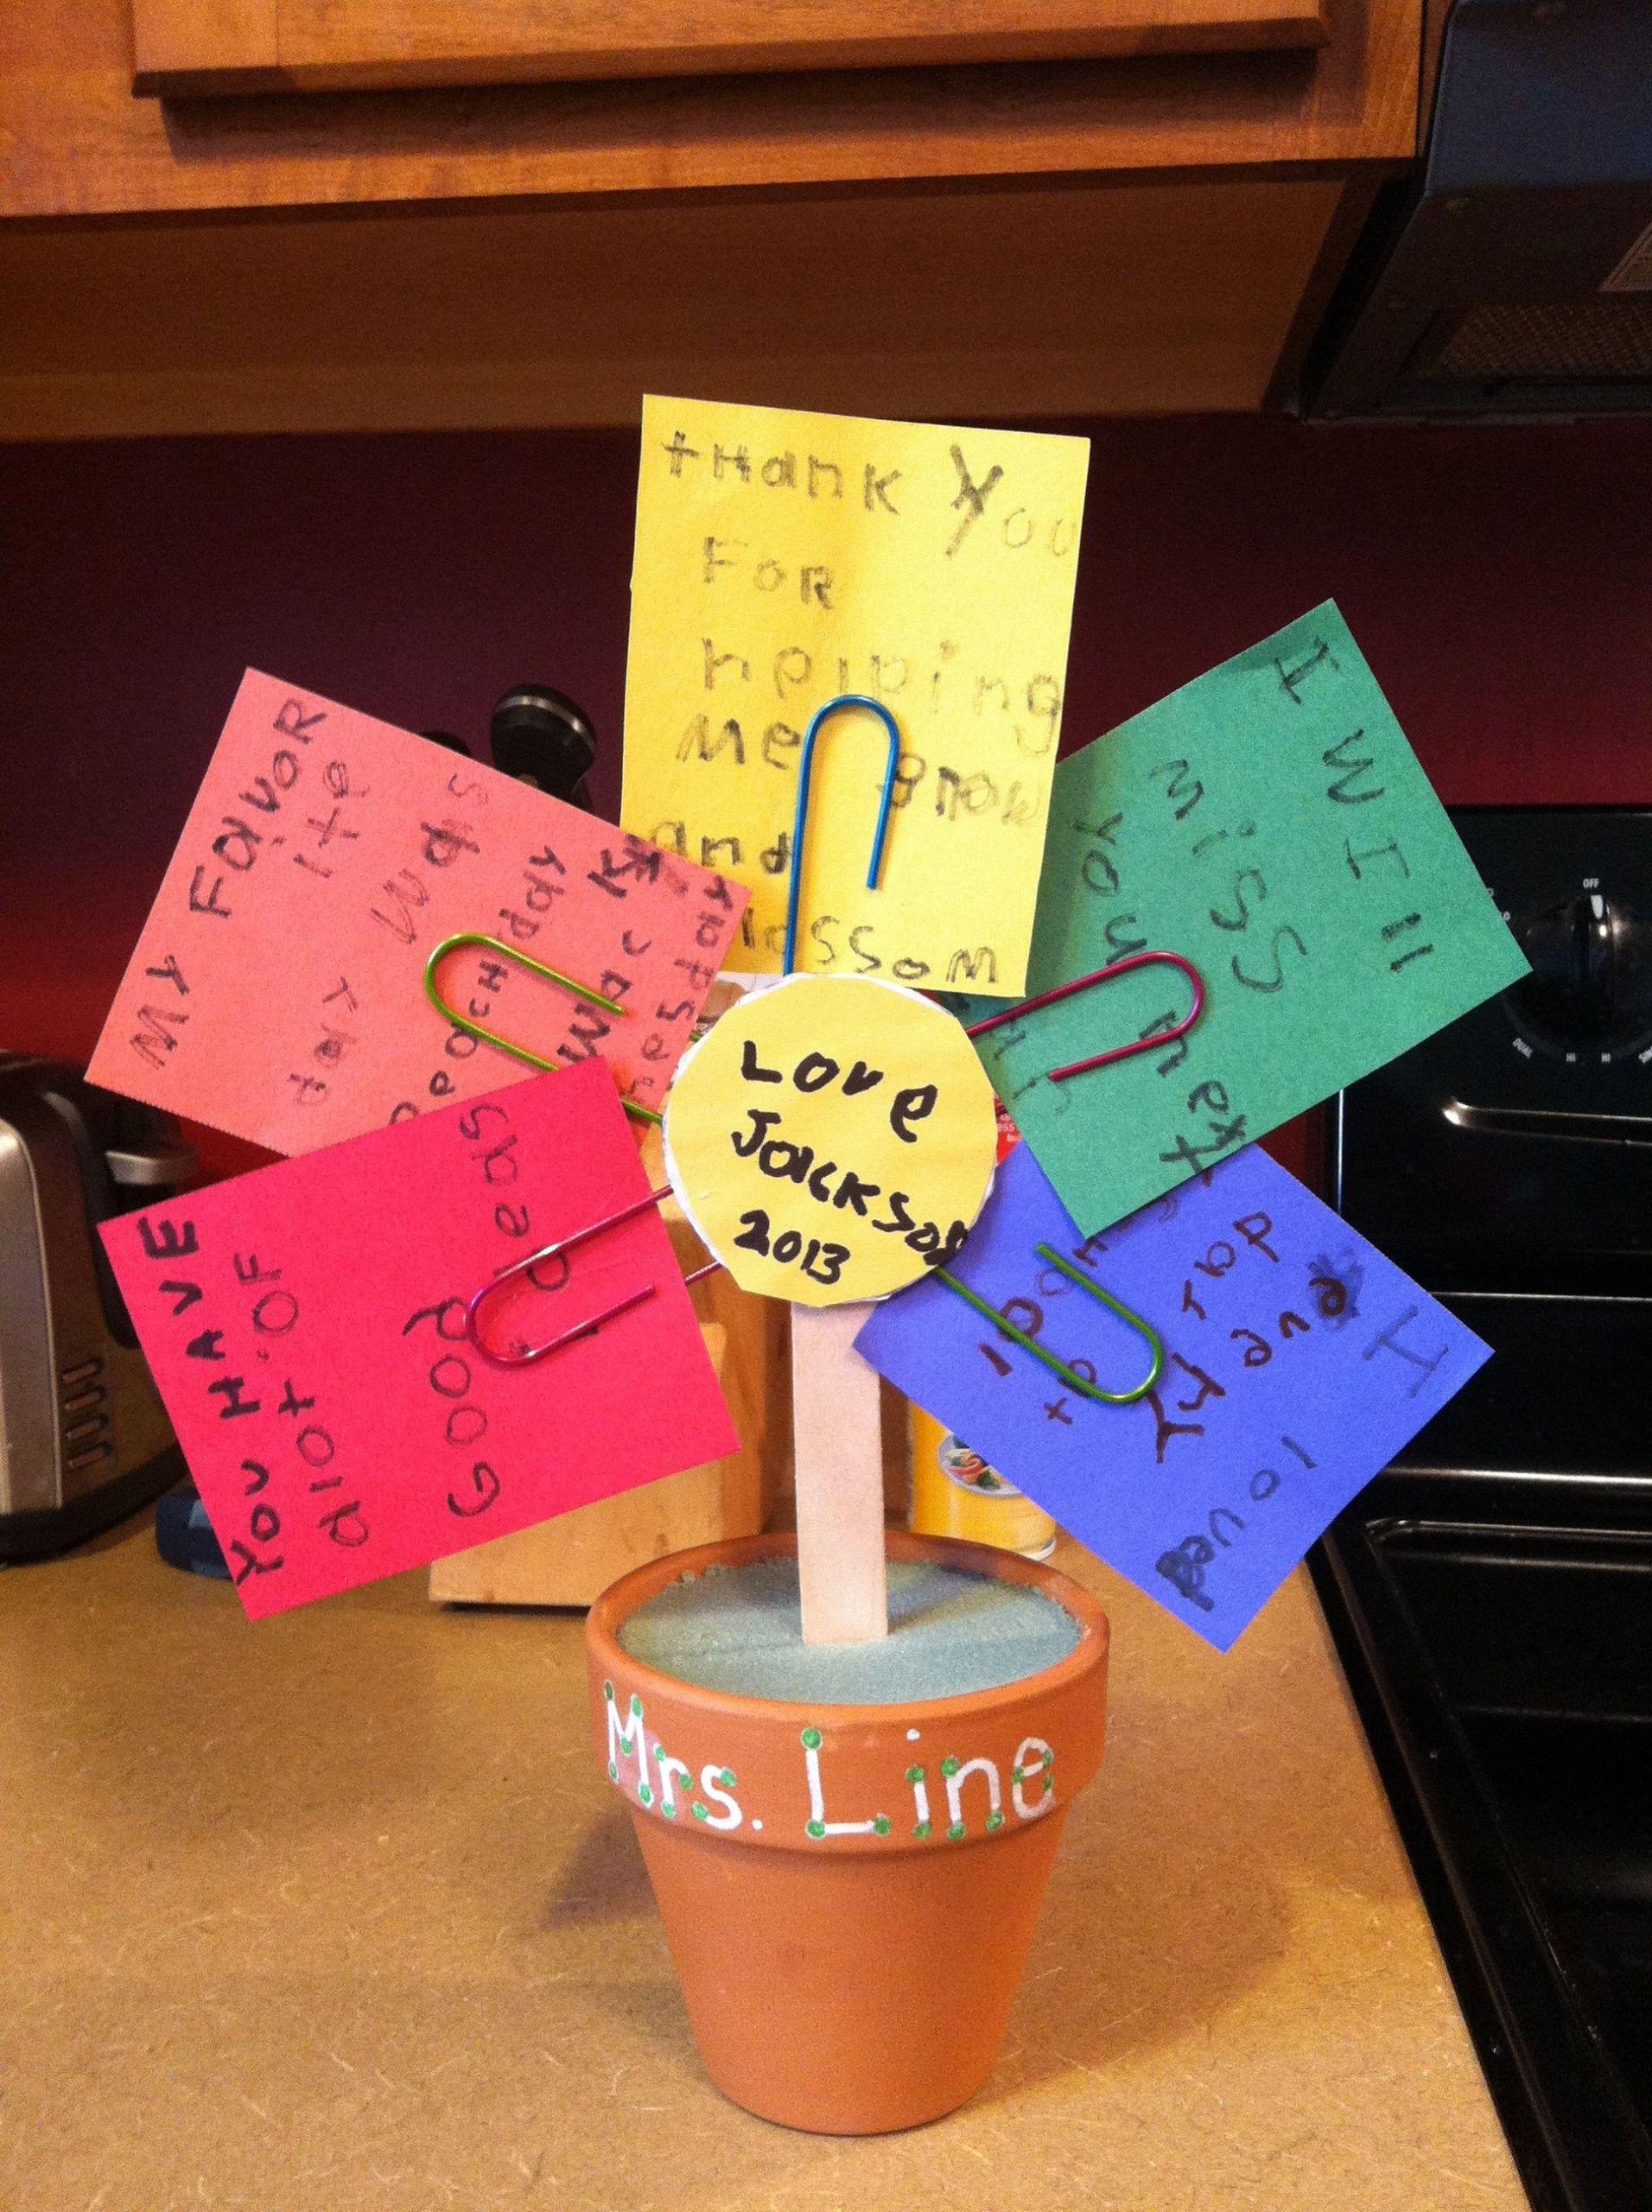 Preschool Graduation Gift Ideas From Teacher  For my son s preschool teacher End of year t